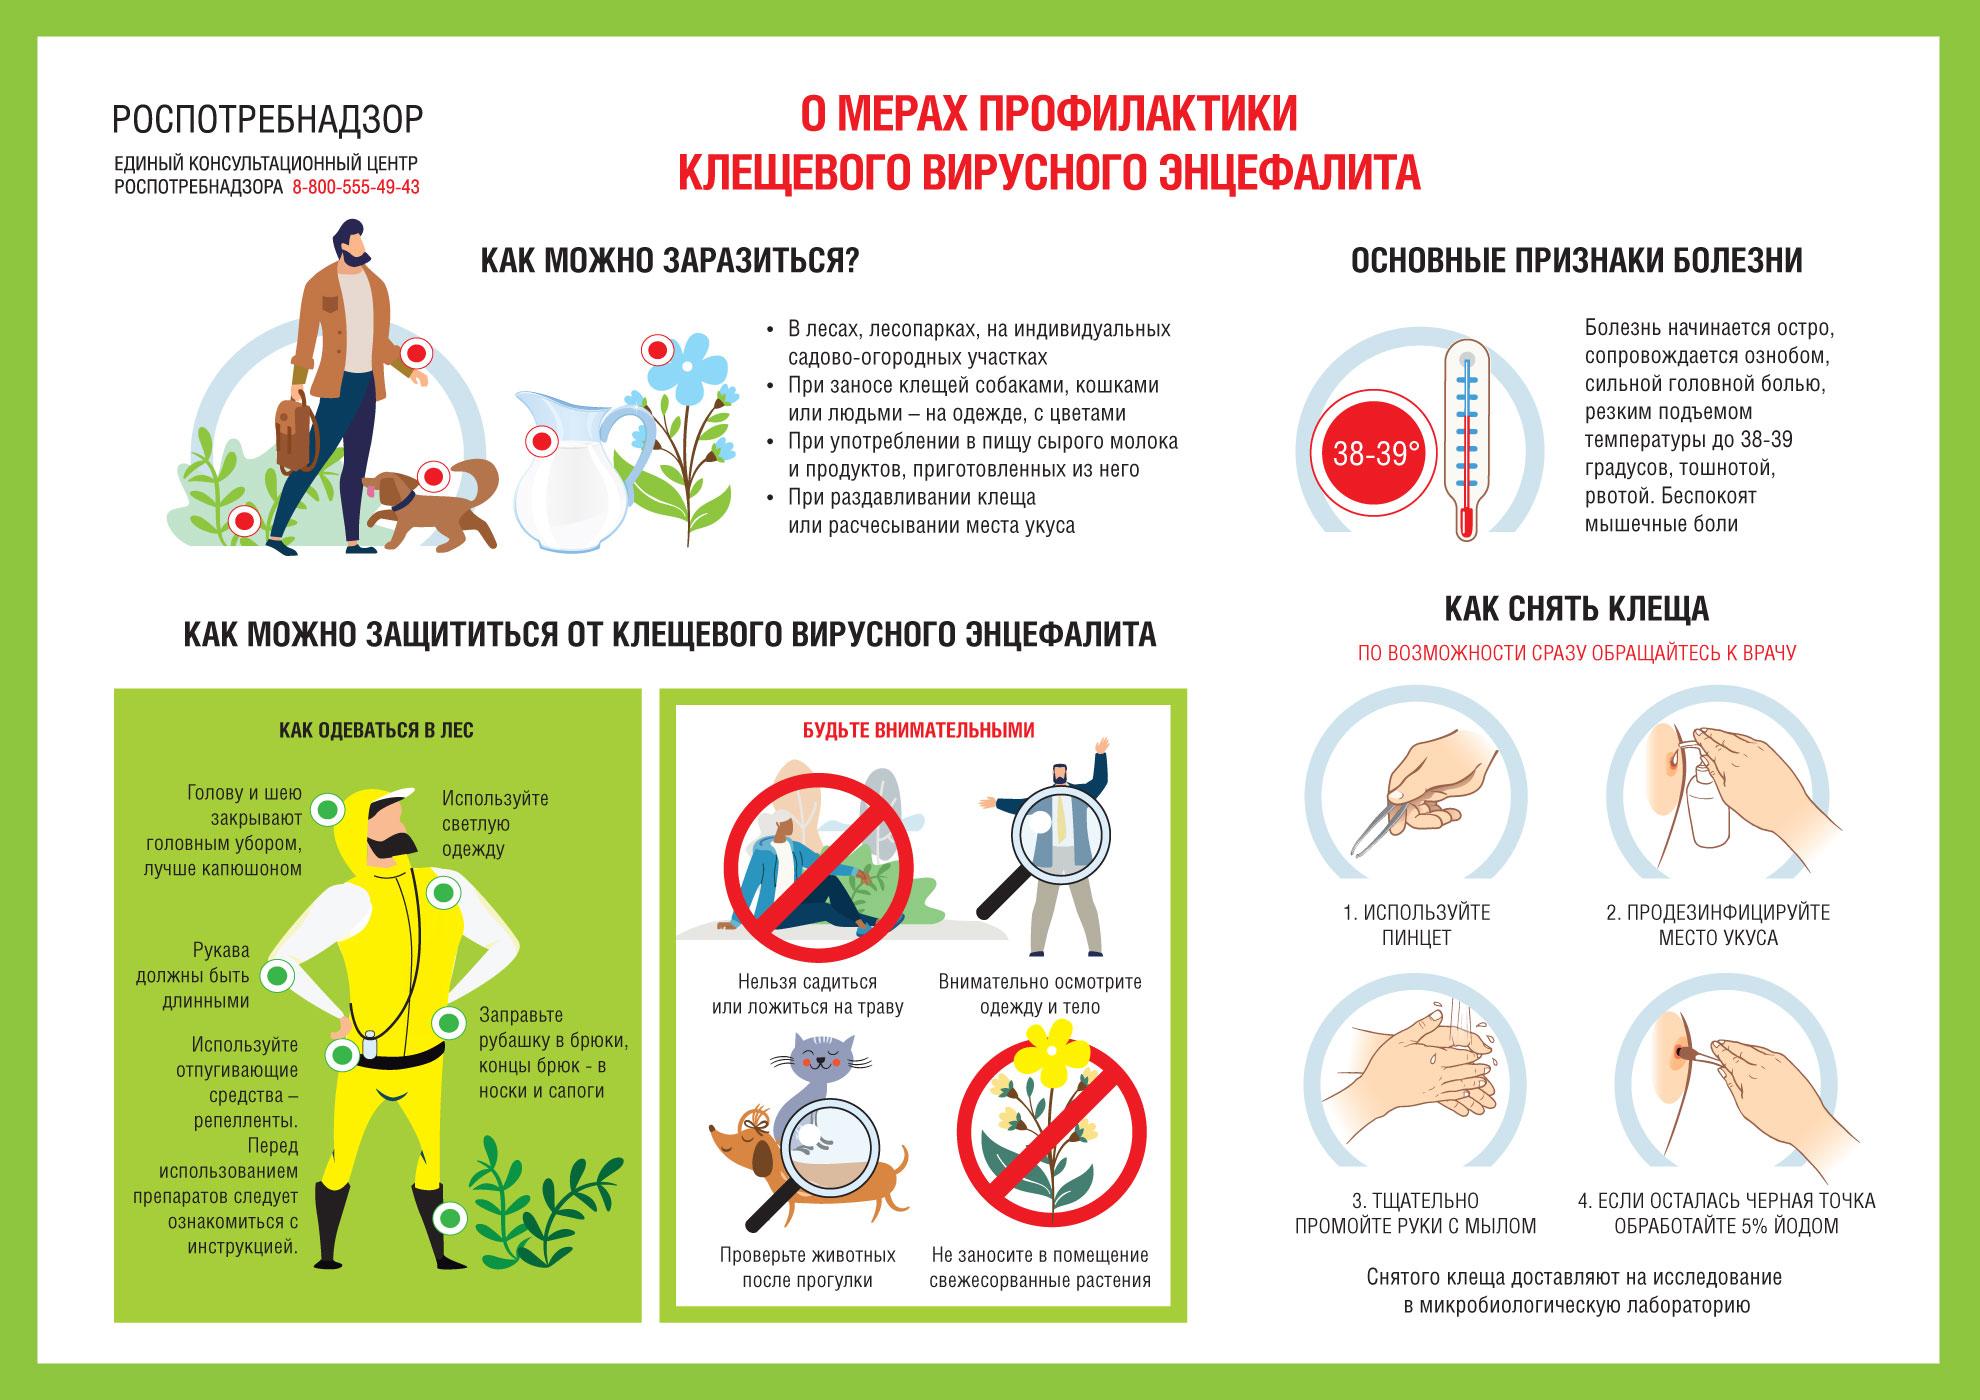 https://www.rospotrebnadzor.ru/files/news/A4-Entsifalit_1980x1400px.jpg